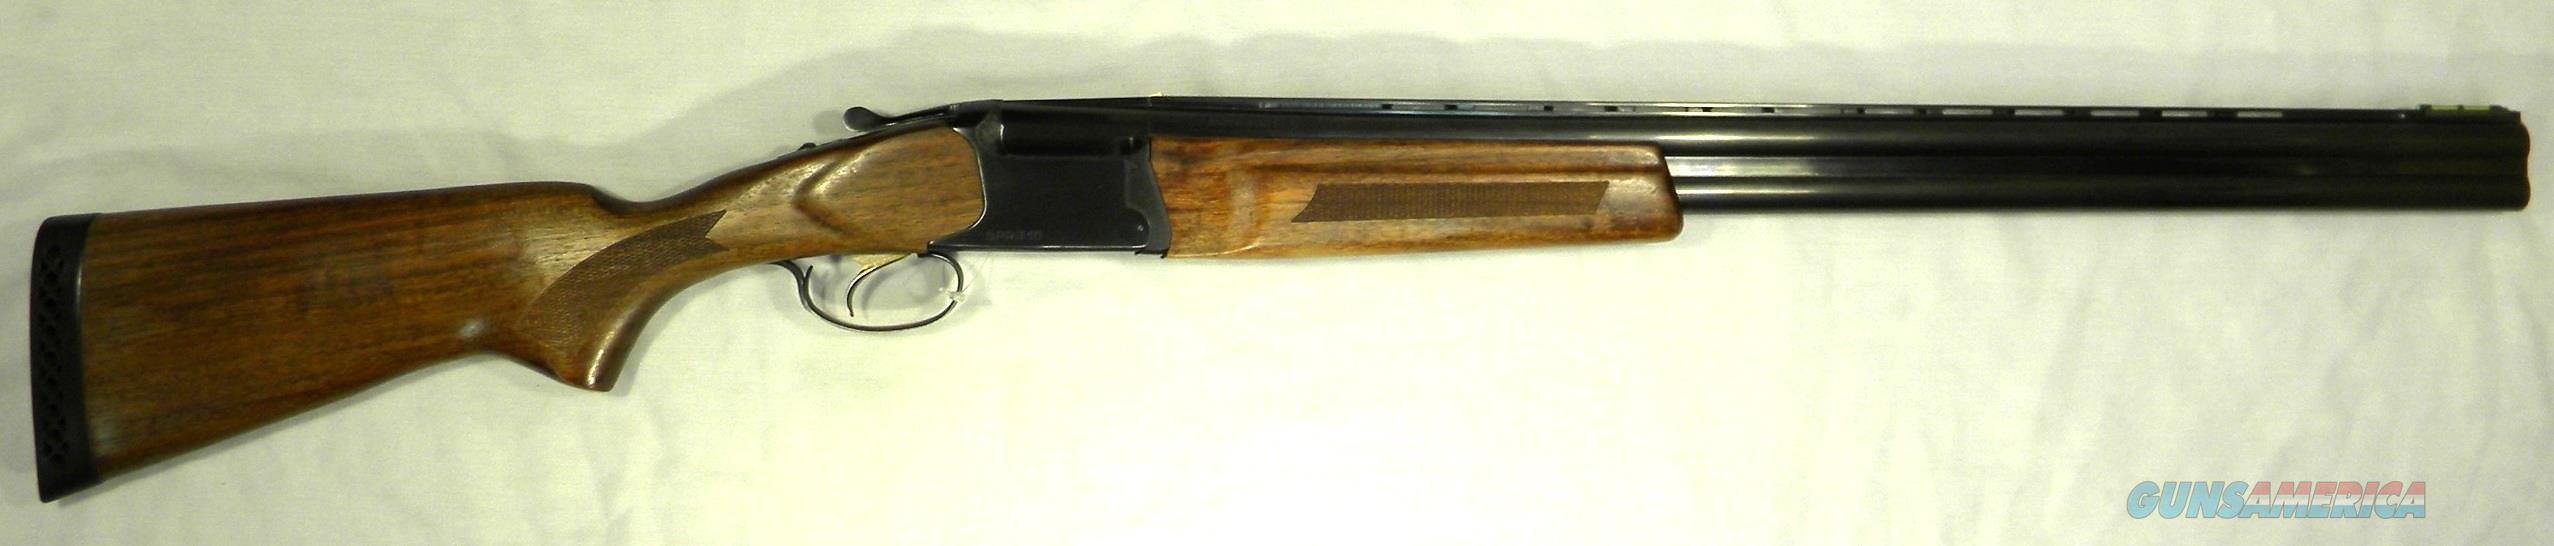 """Spartan Gunworks"" SPR310 Over/Under 12 Gauge Shotgun, Made In Russia, Great Shape!  Guns > Shotguns > S Misc Shotguns"